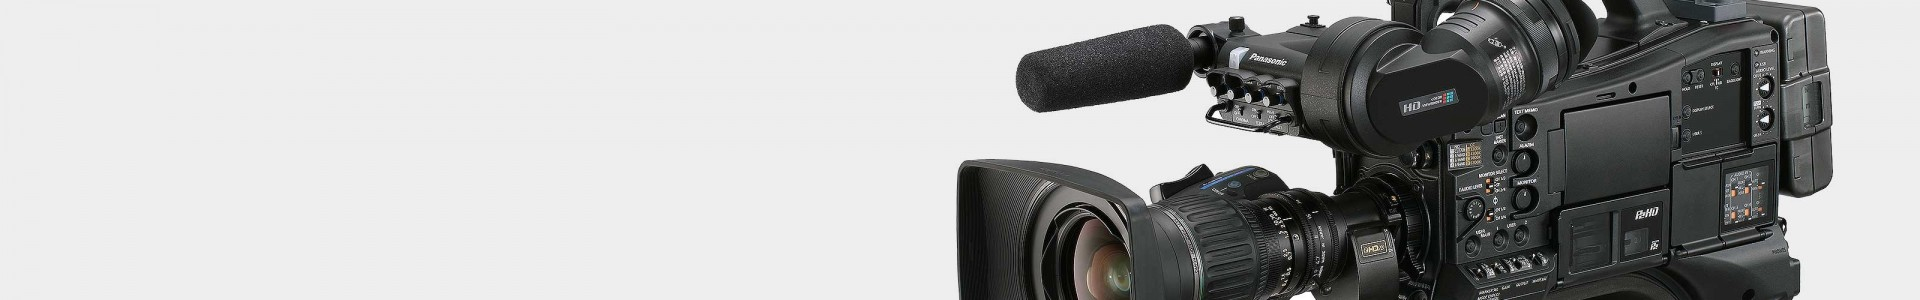 All Panasonic professional video cameras - Avacab